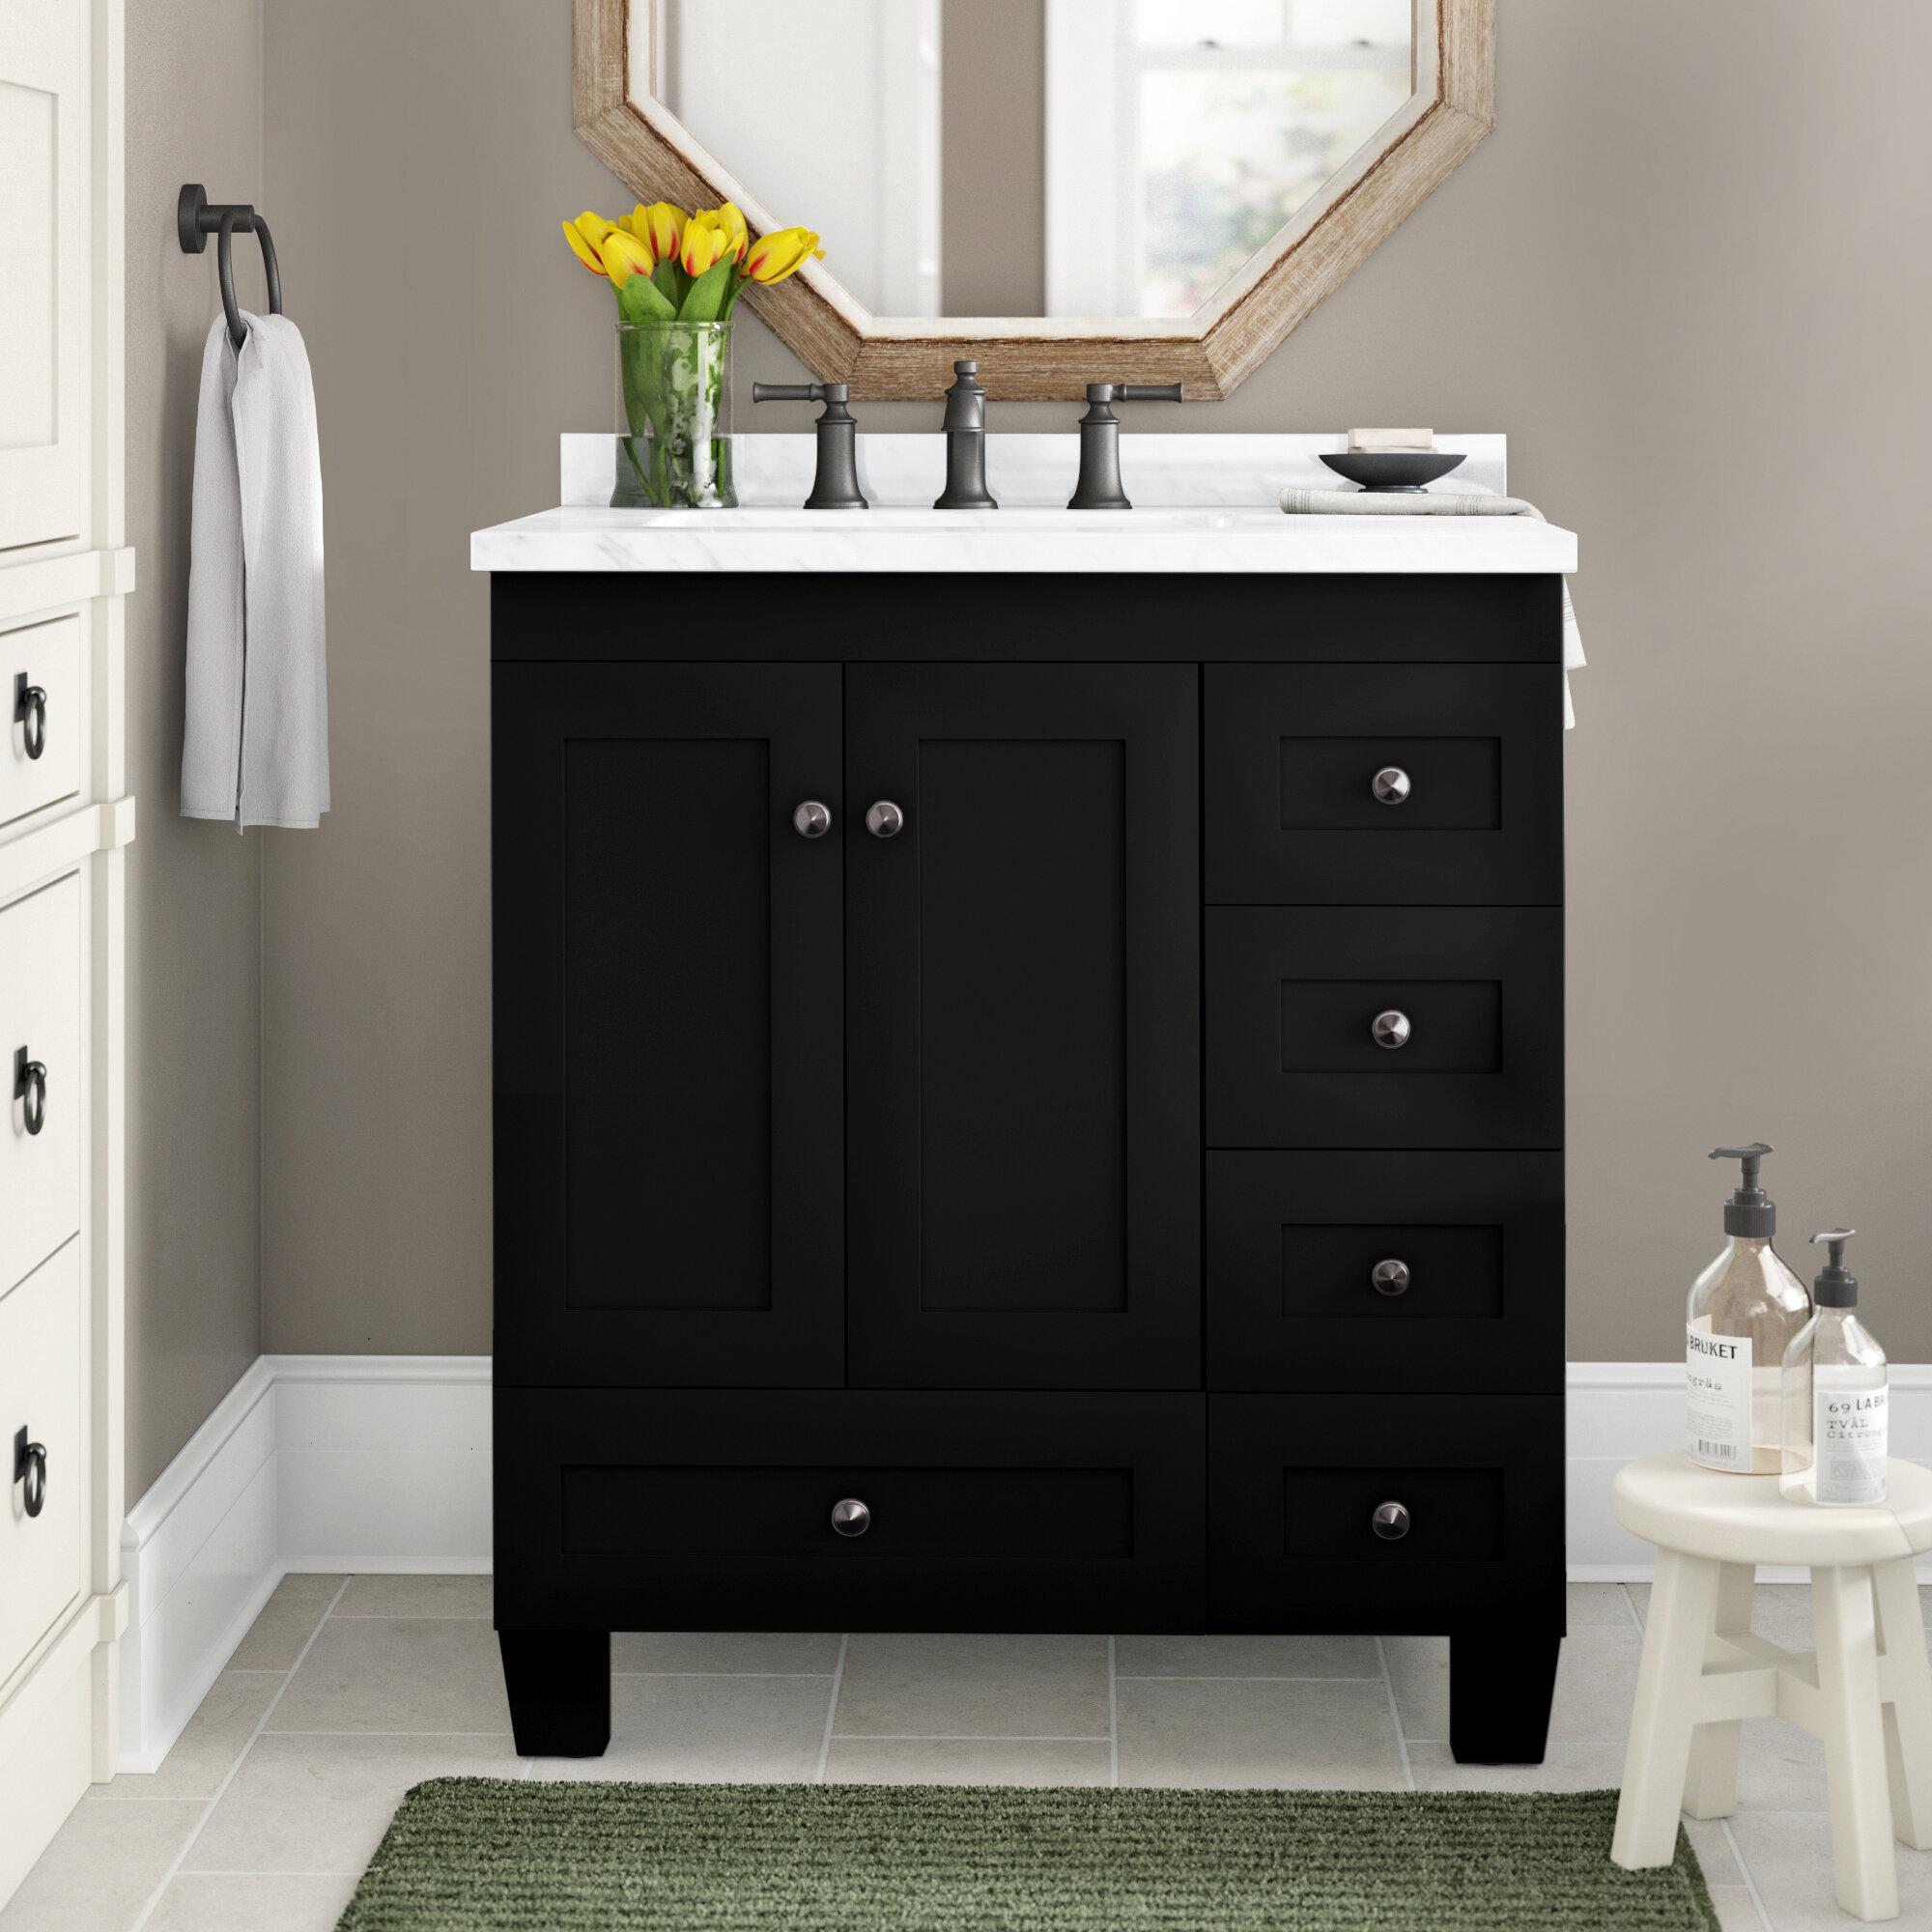 24 Inch Premium Grey Bathroom Vanity Sink Combo,Bath Vanity with Sink Mdern Bathroom Vanity Cabinet with Ceramic Sink,Single Bathroom Vanity Set with 1 Shelf 2 Drawers